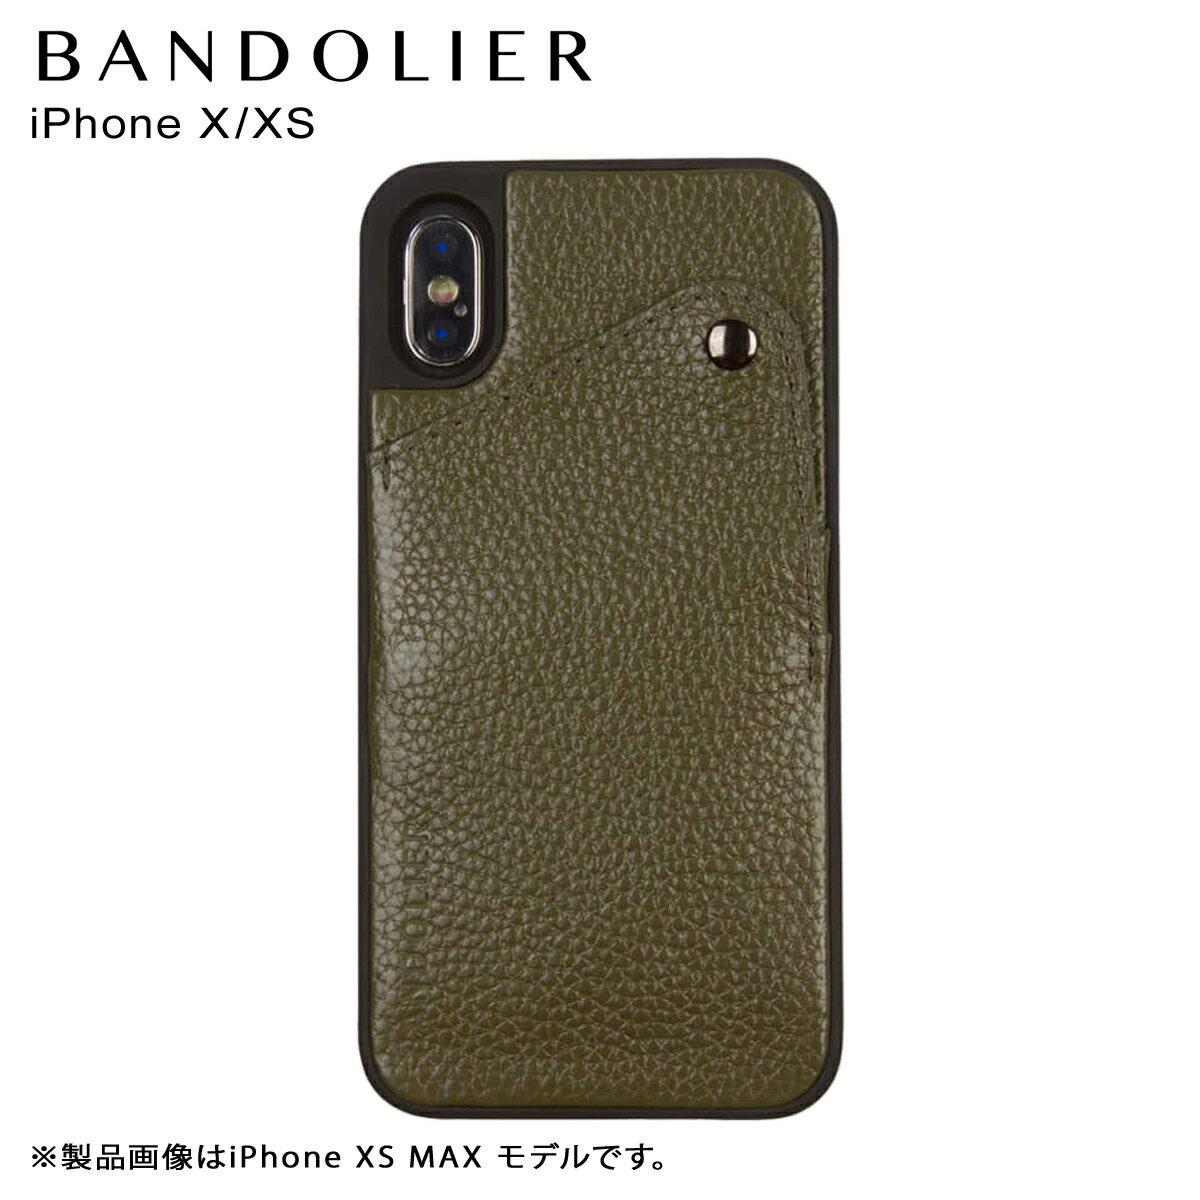 BANDOLIER バンドリヤー iPhone XS X ケース スマホ アイフォン レザー ALEX GREEN メンズ レディース グリーン